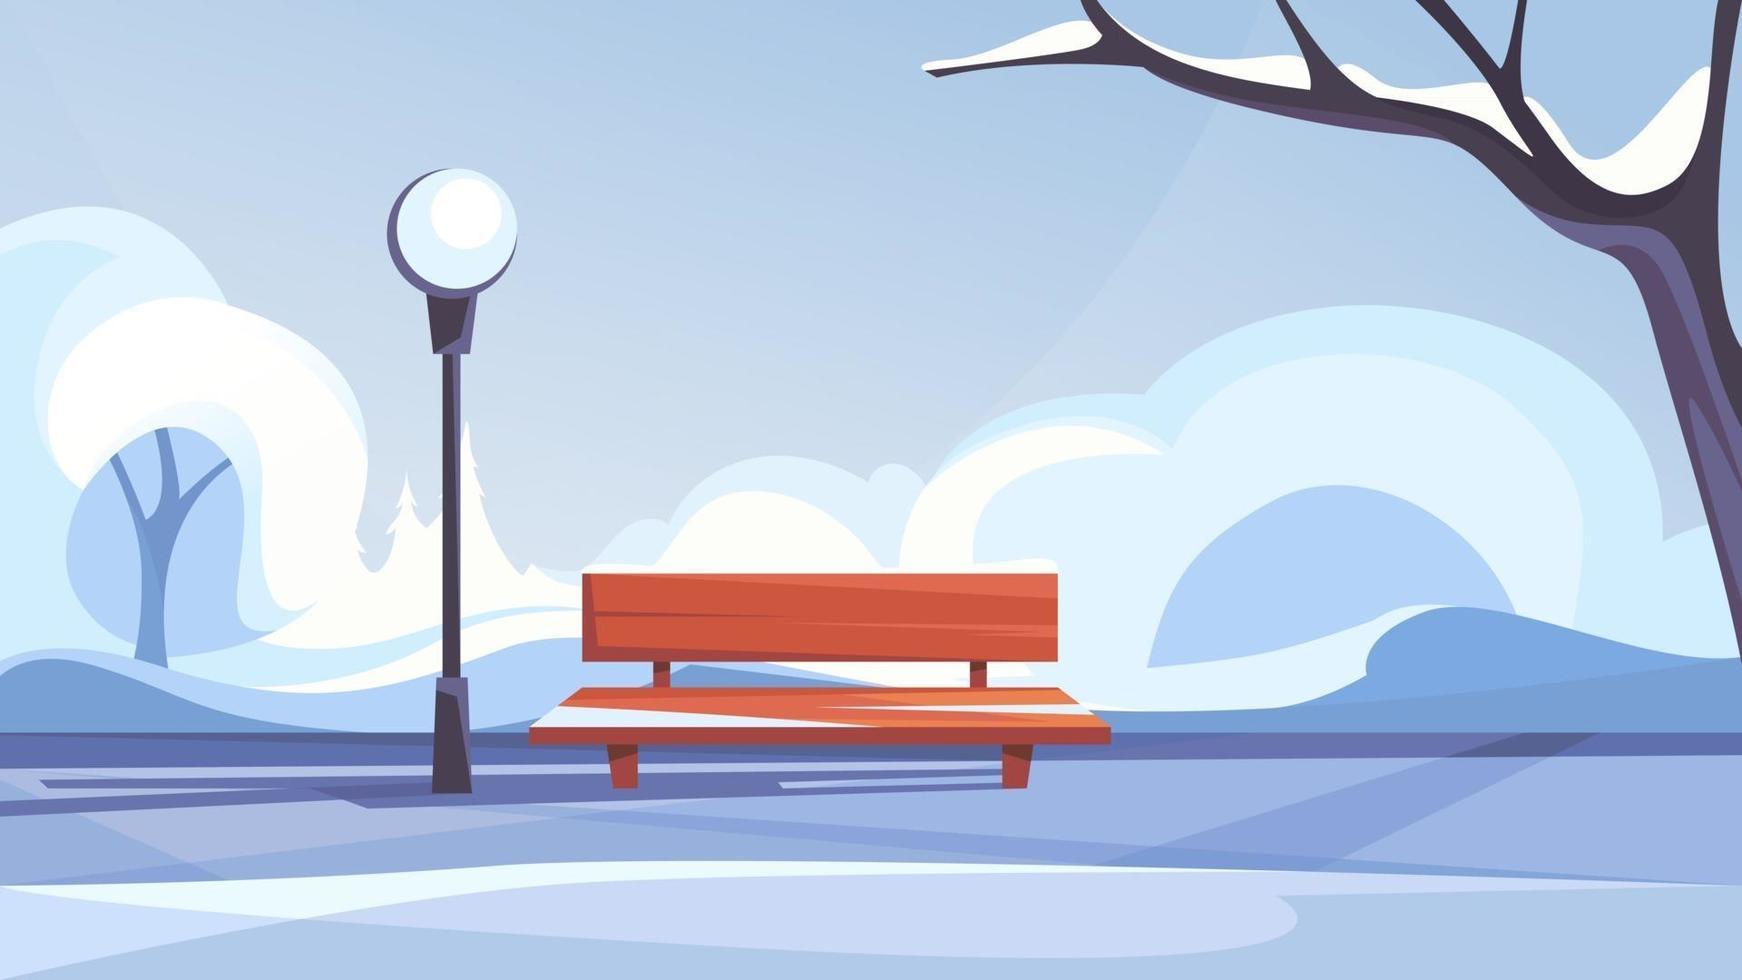 Winter public park. vector